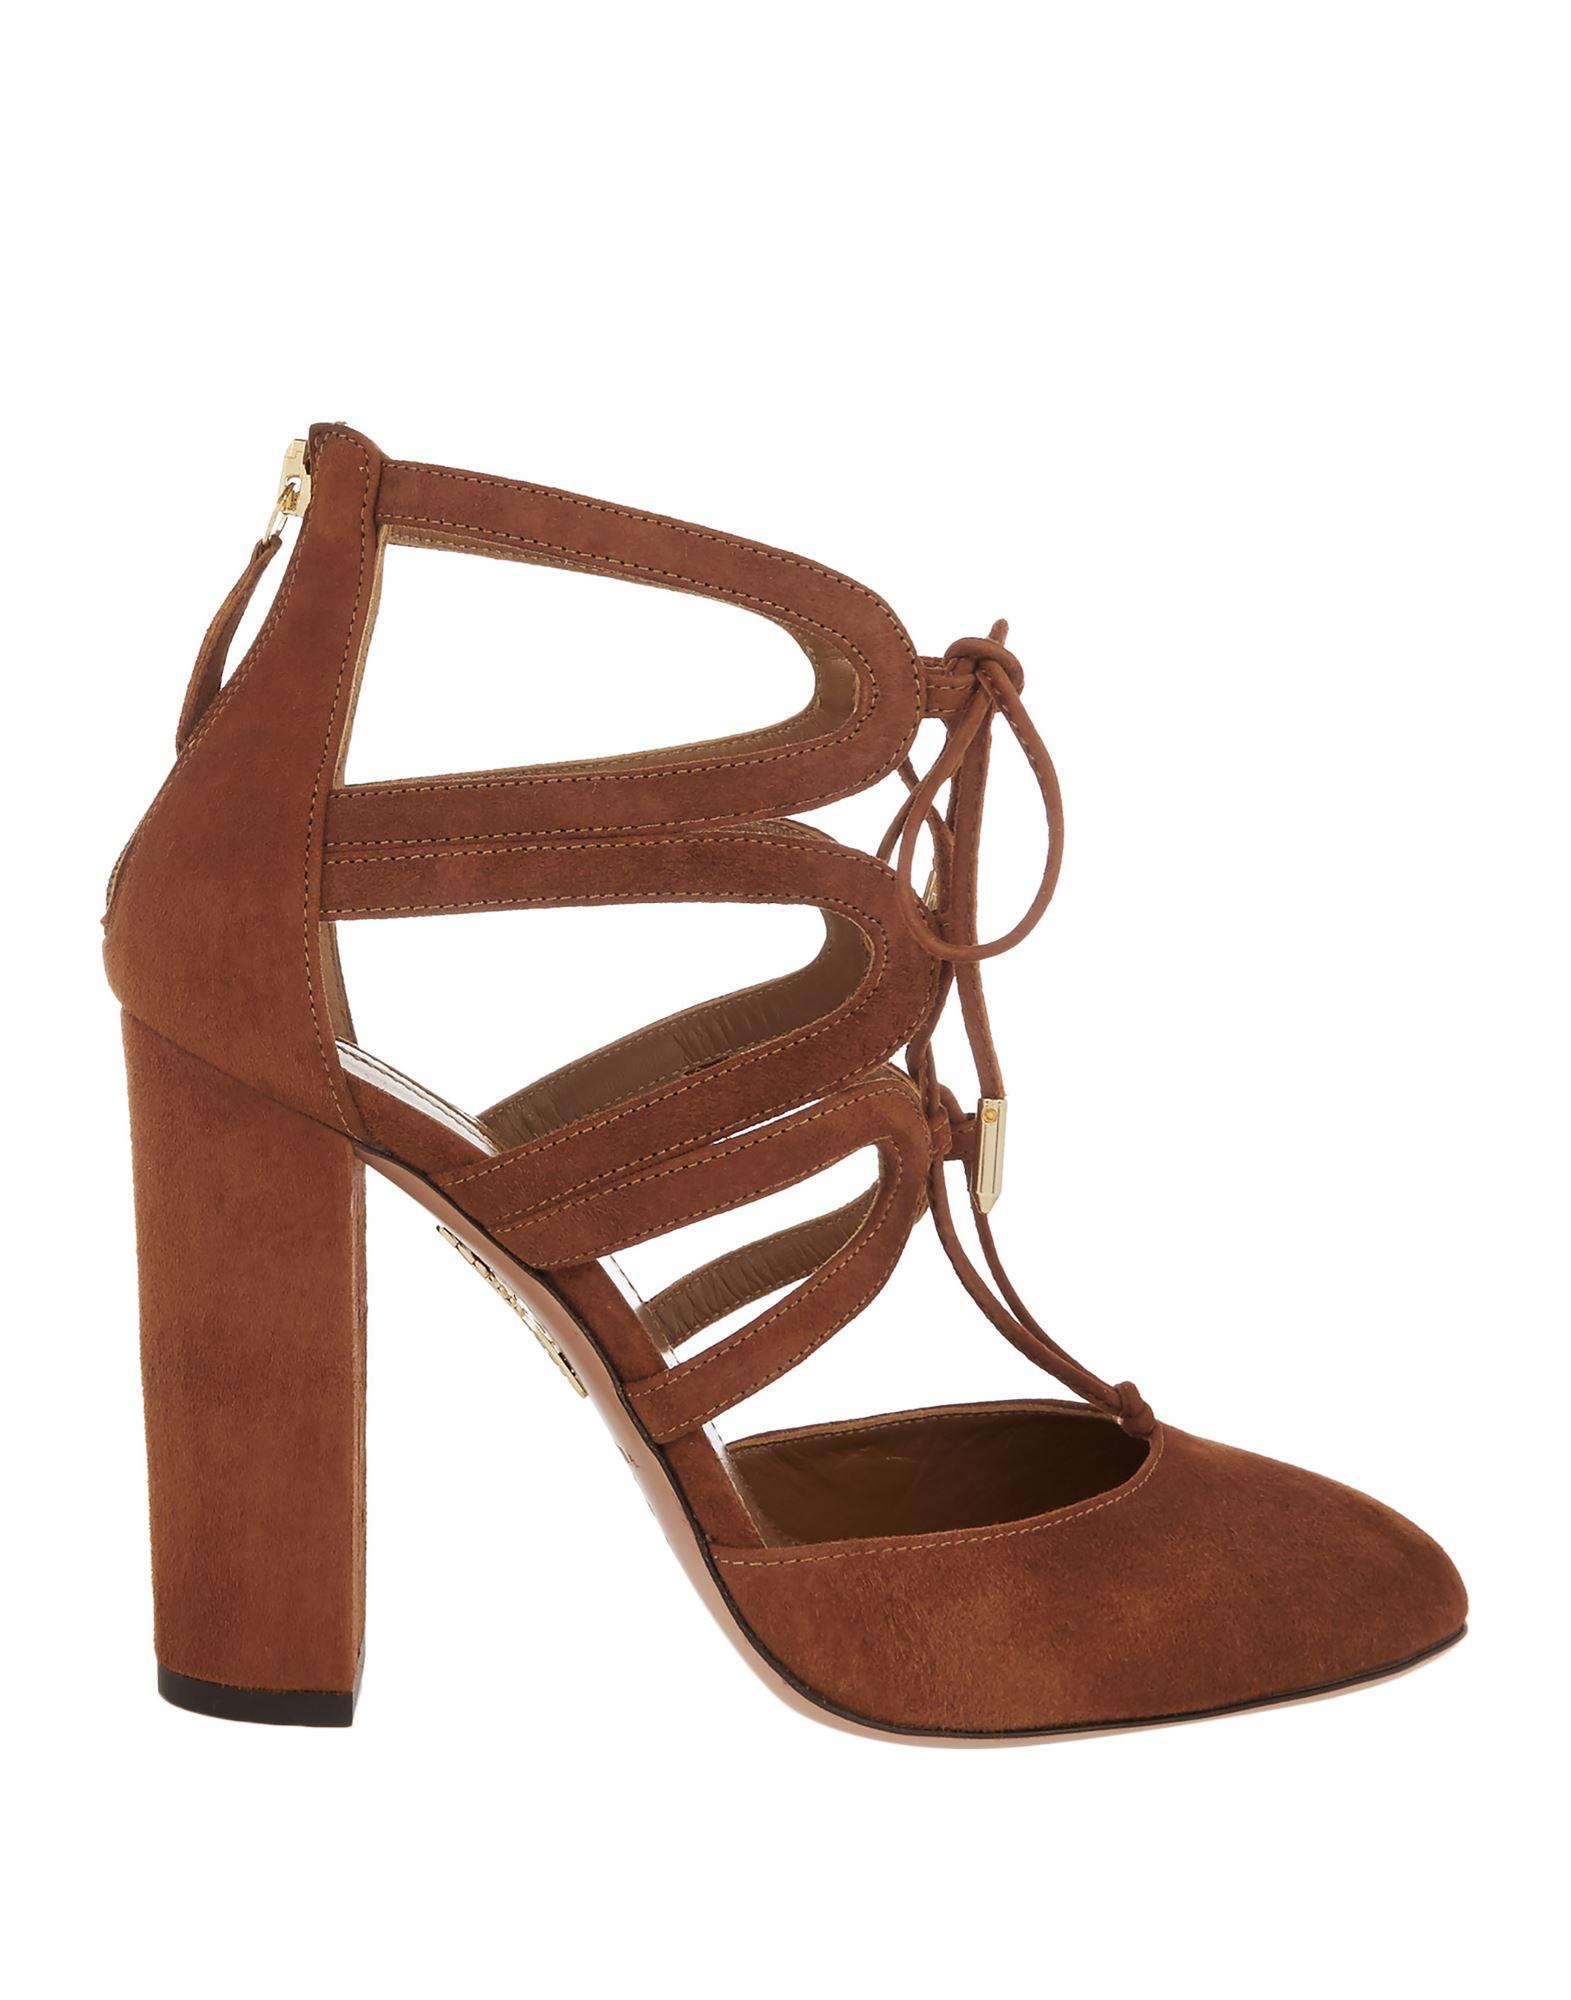 AQUAZZURA Туфли aquazzura черные туфли с ремешками charisma pump 105